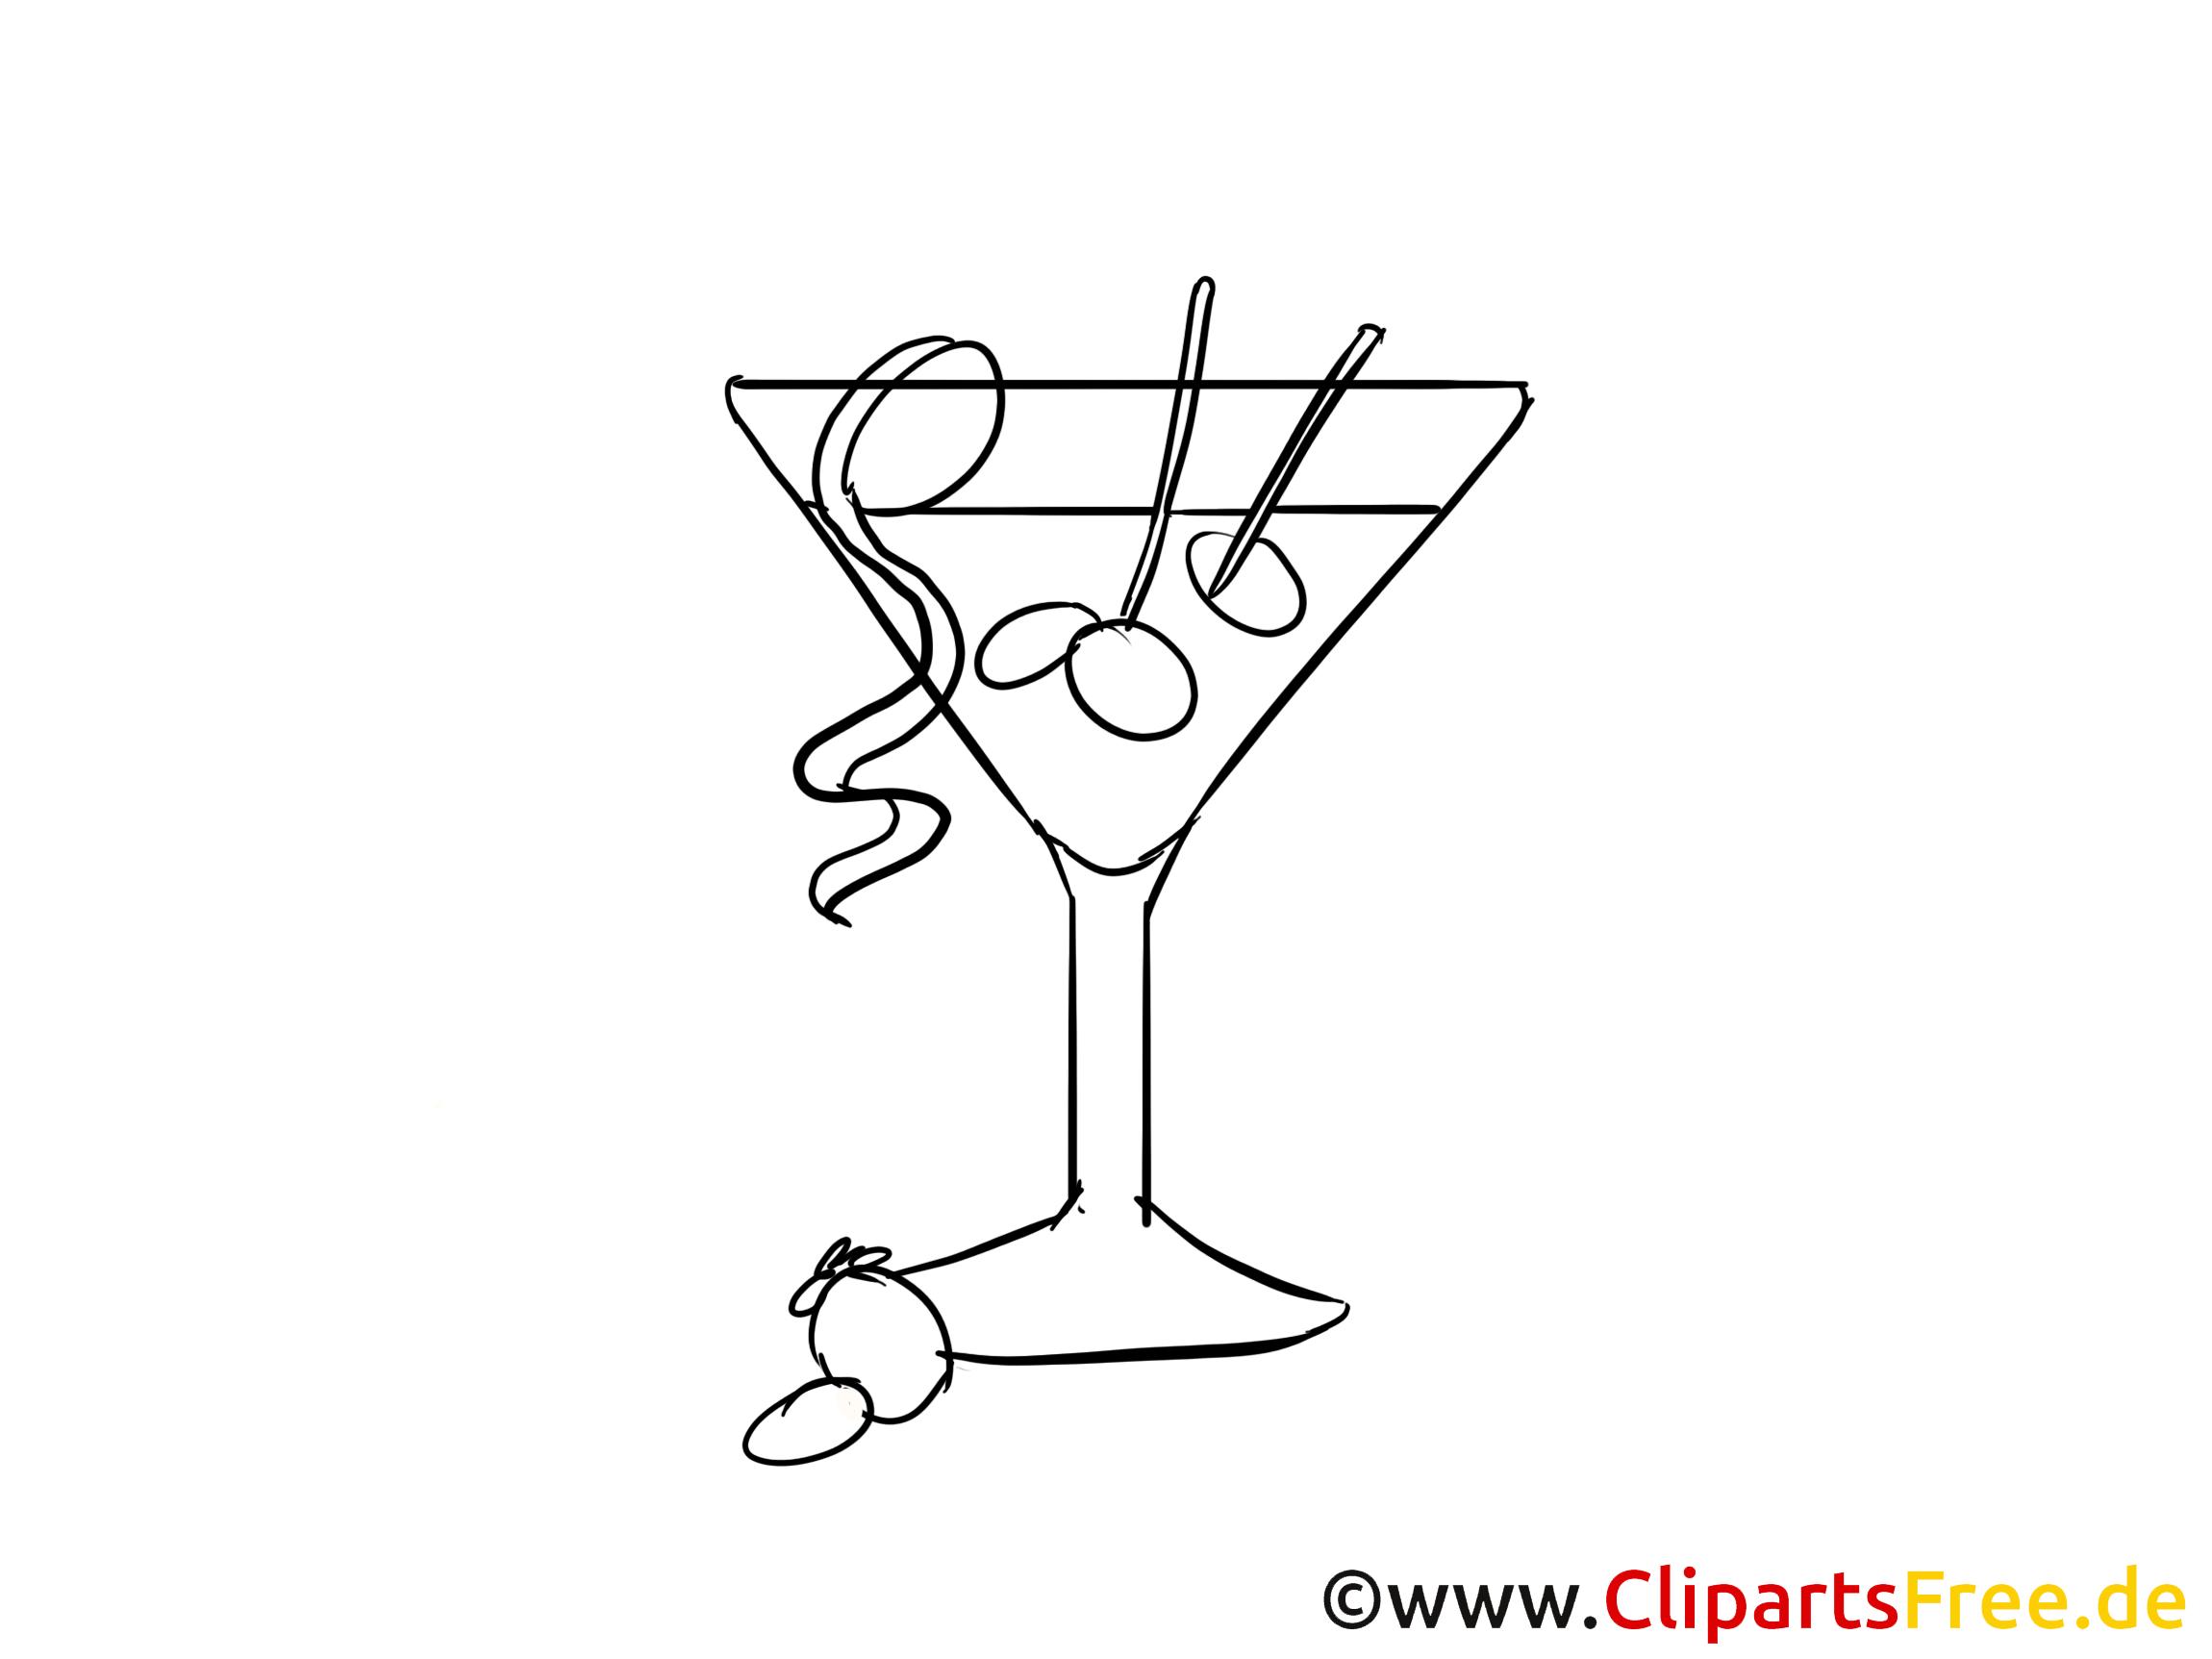 Cocktail dessin gratuit imprimer faire la f te dessin picture image graphic clip art - Dessin cocktail ...